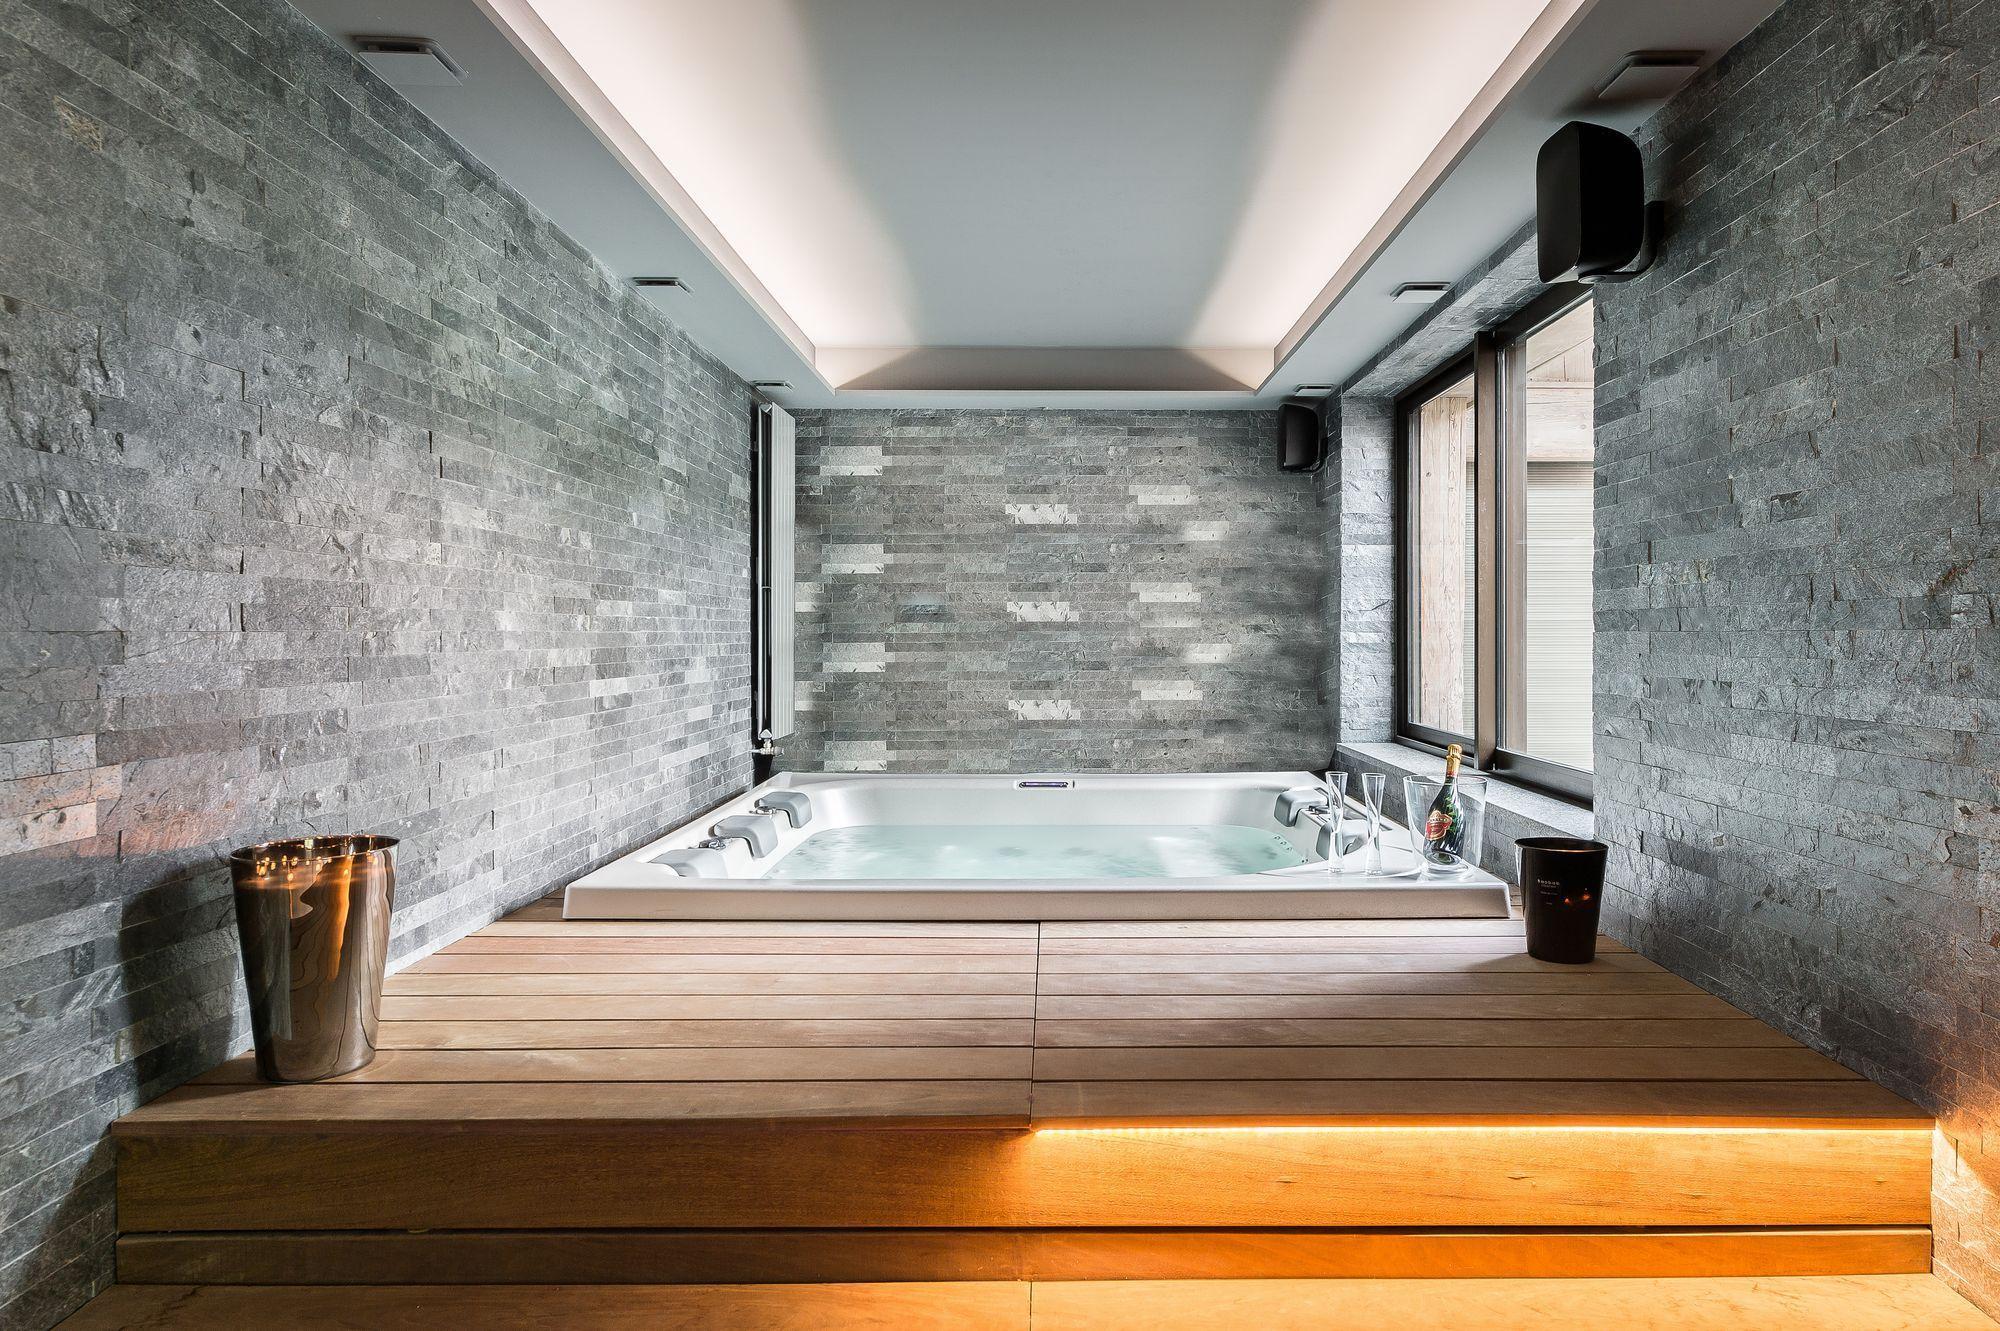 Jacuzzi Interieur Luxe